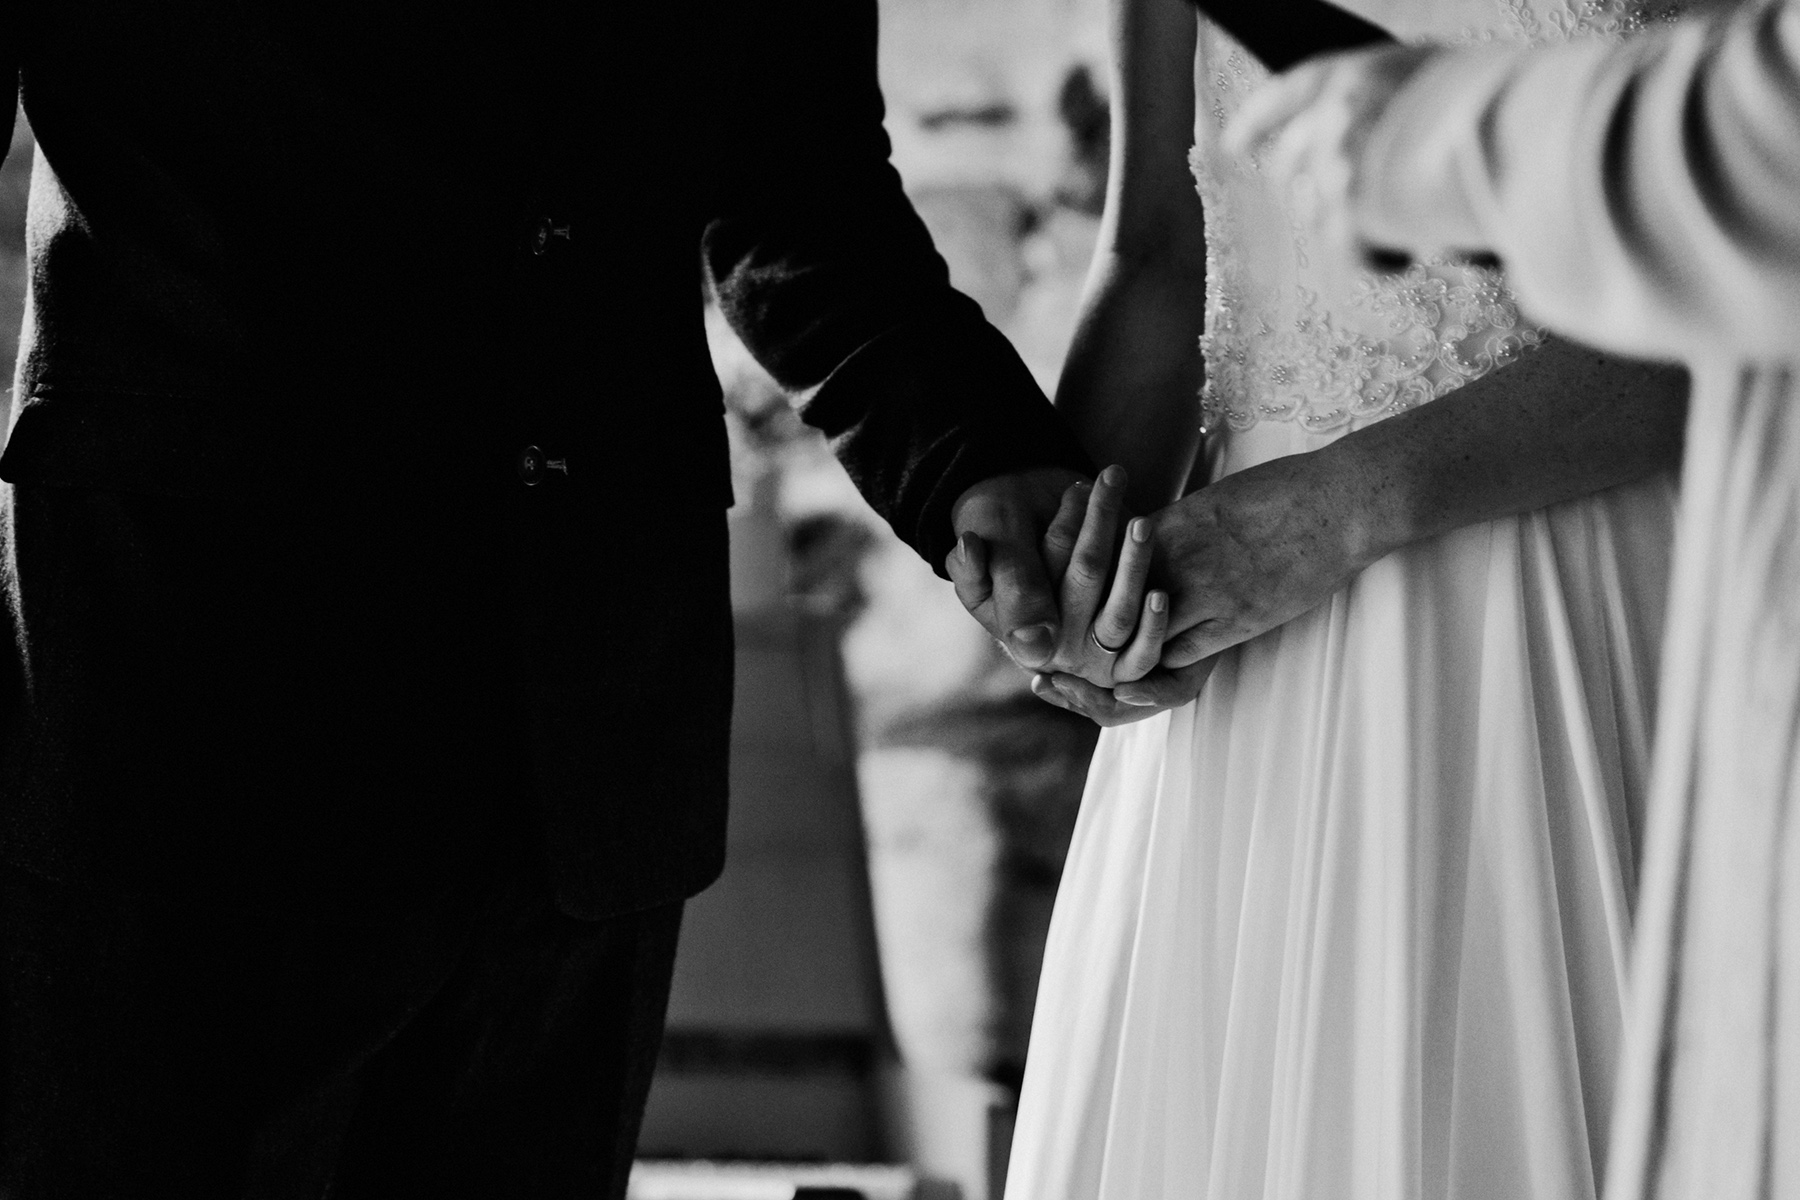 Snowdonia-Wales-Wedding-Photos-0317.jpg